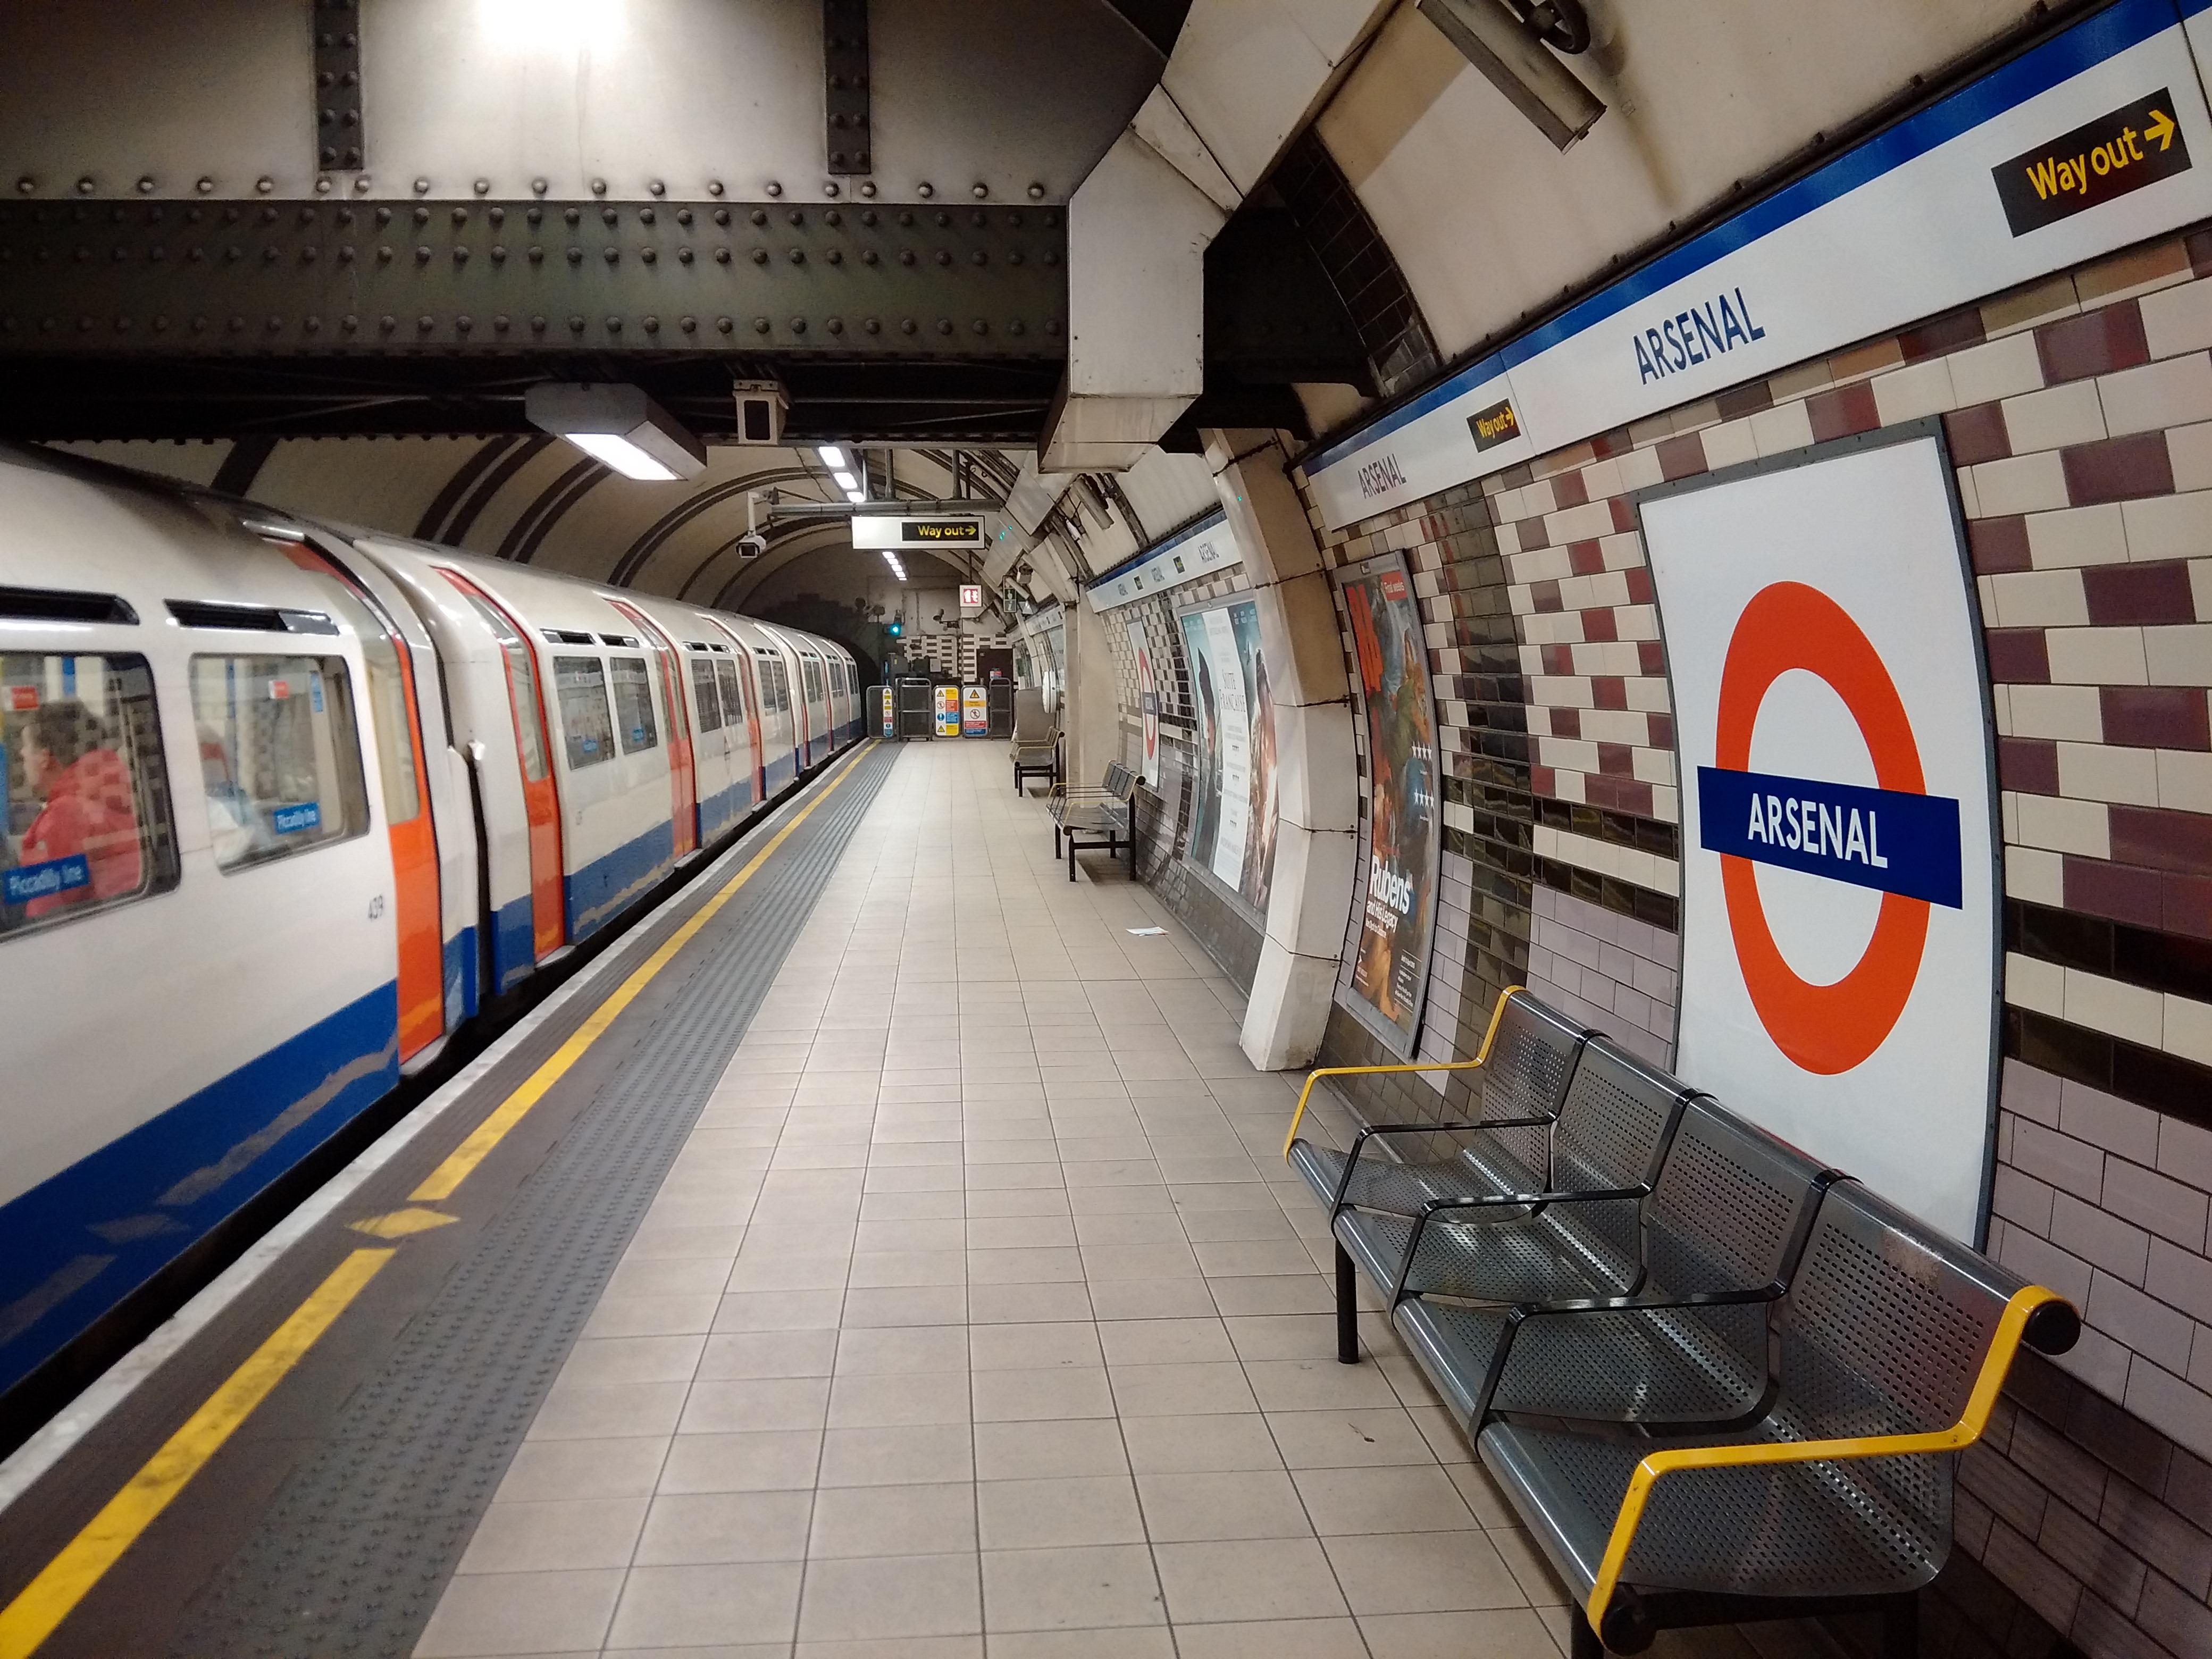 Filearsenal Underground Stationjpg Wikimedia Commons